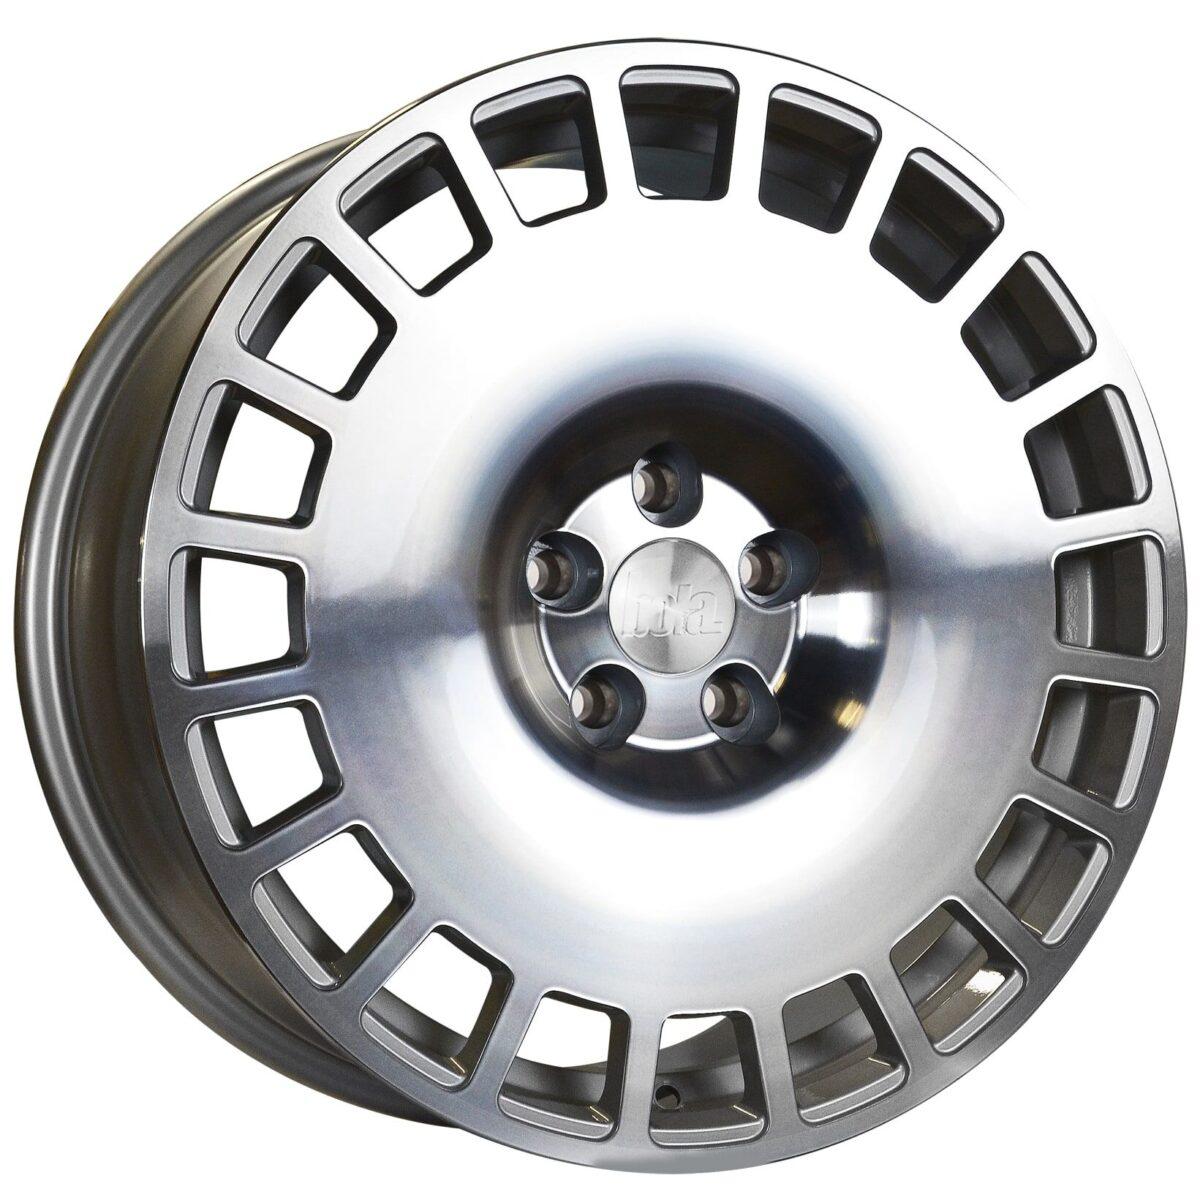 "18"" BOLA B12 Wheels - Silver Polished Face - VW / Audi / Mercedes - 5x112"